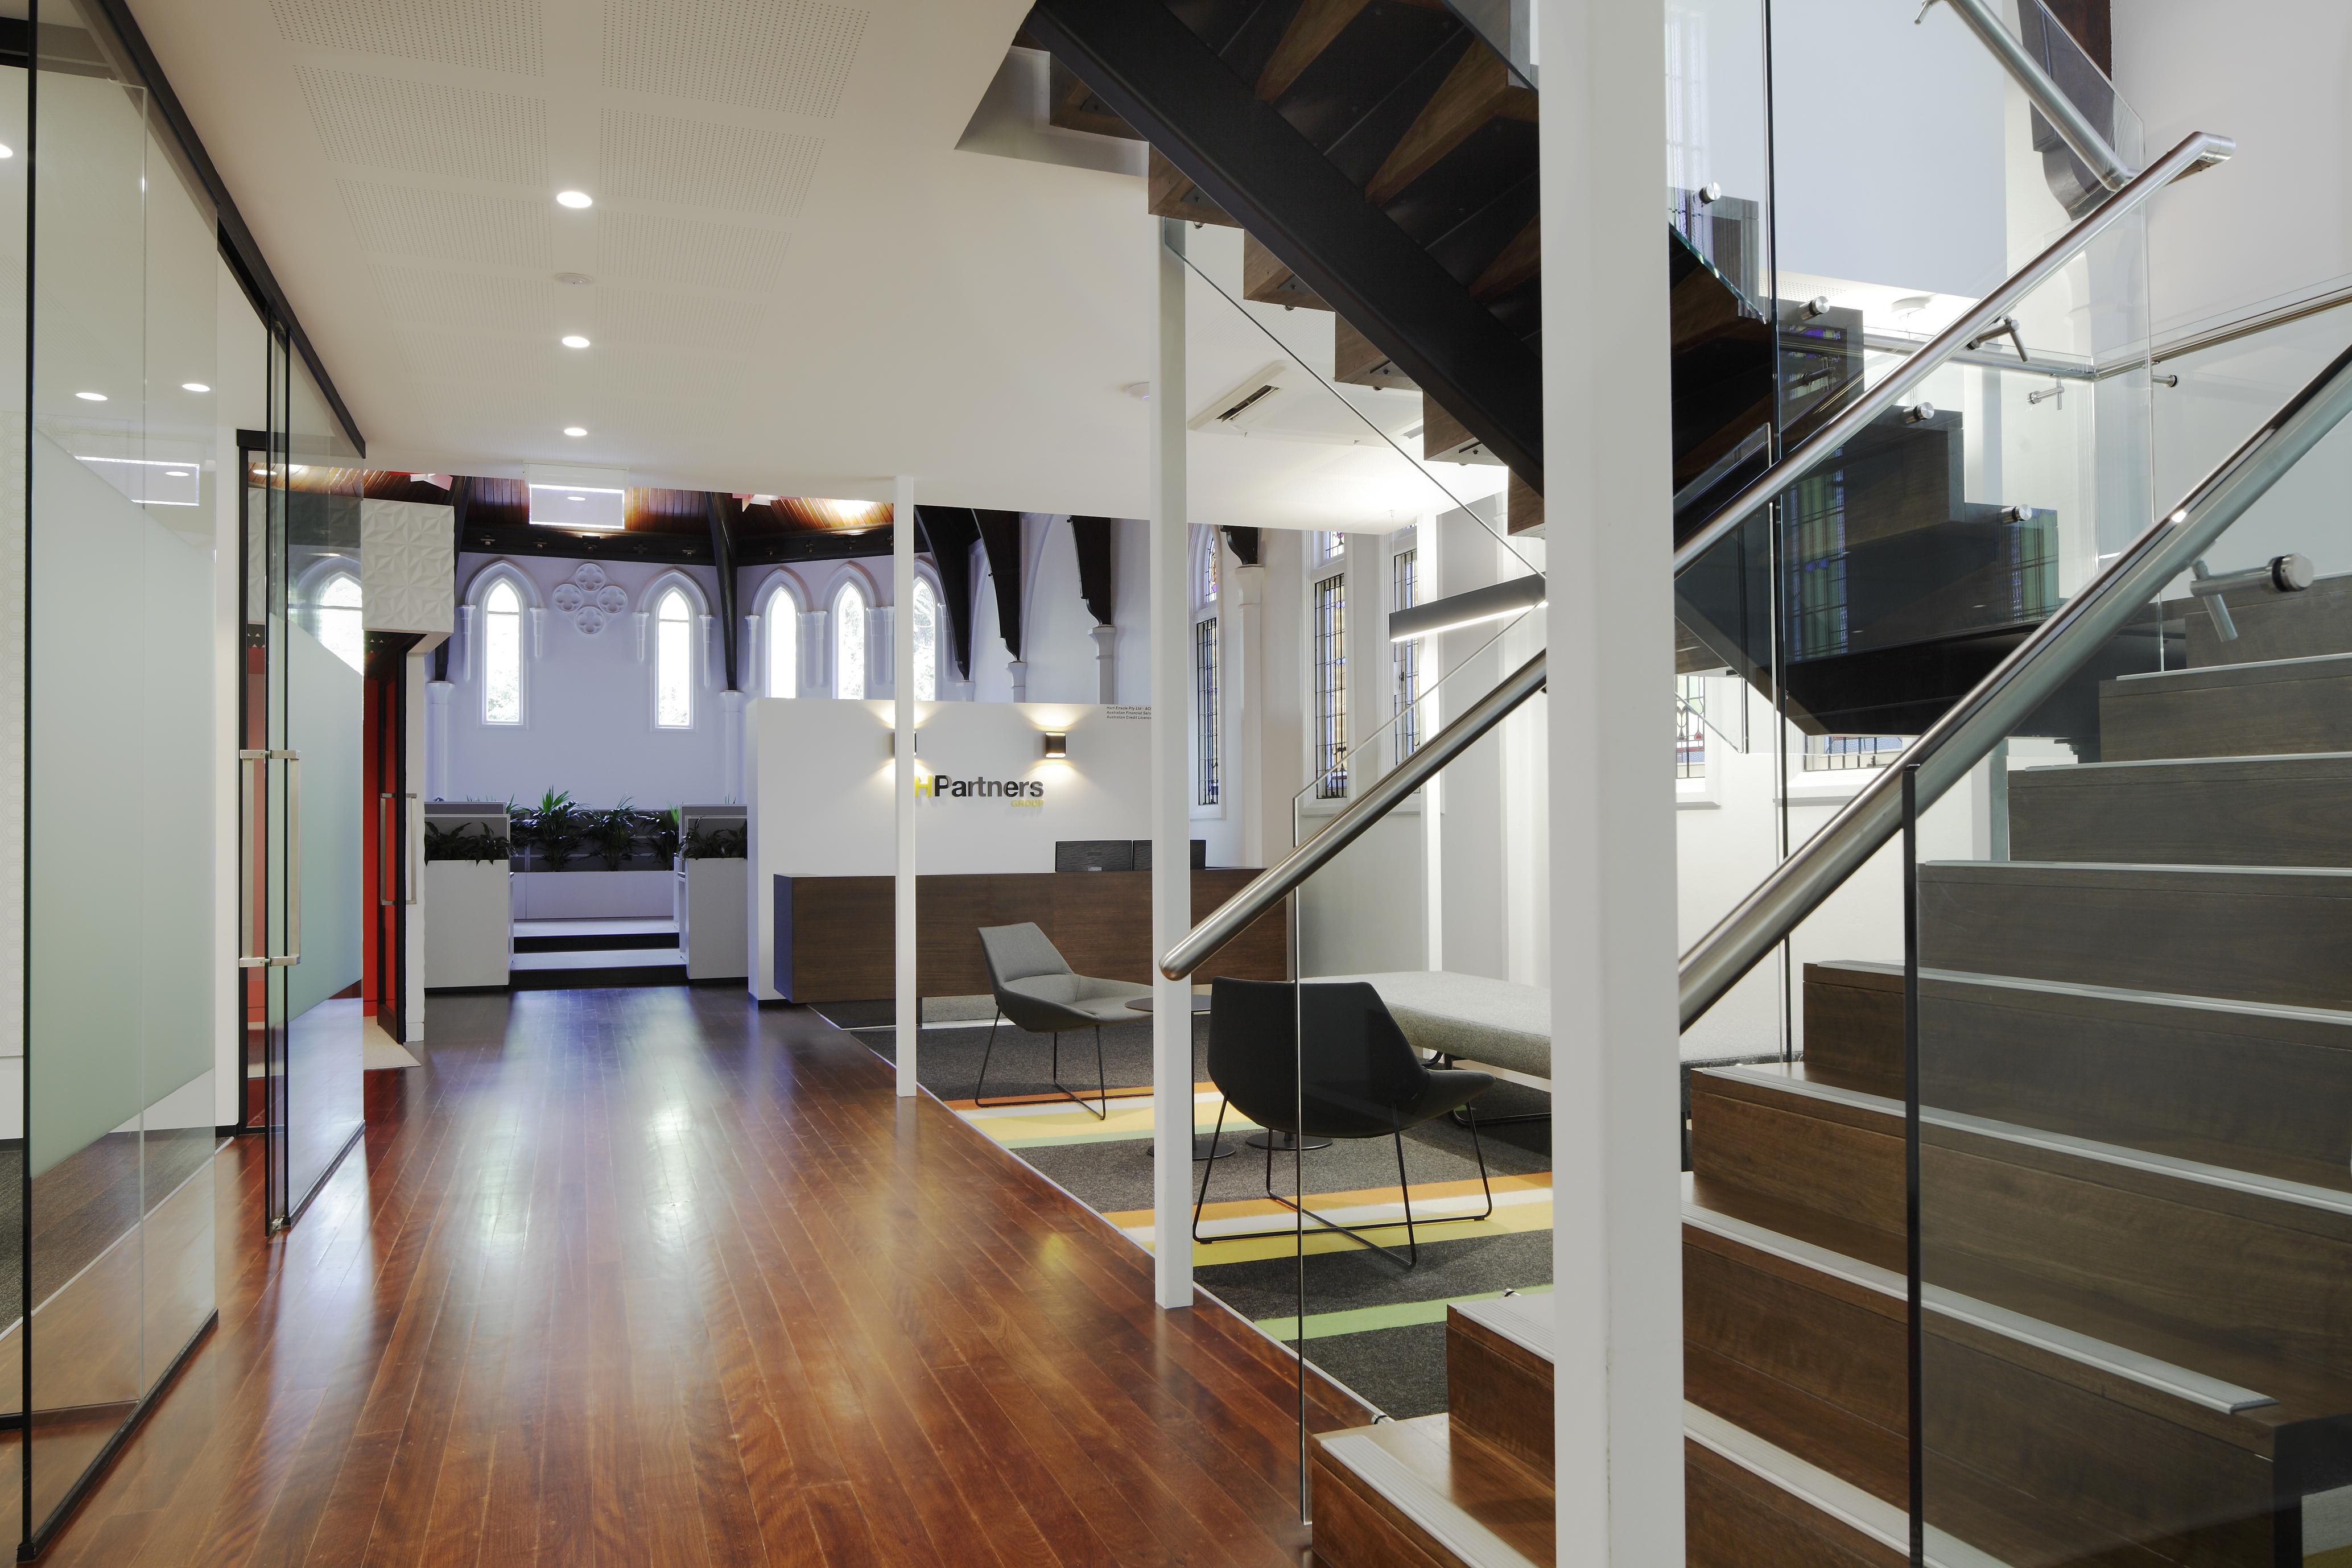 Workplace, Brisbane, Australia